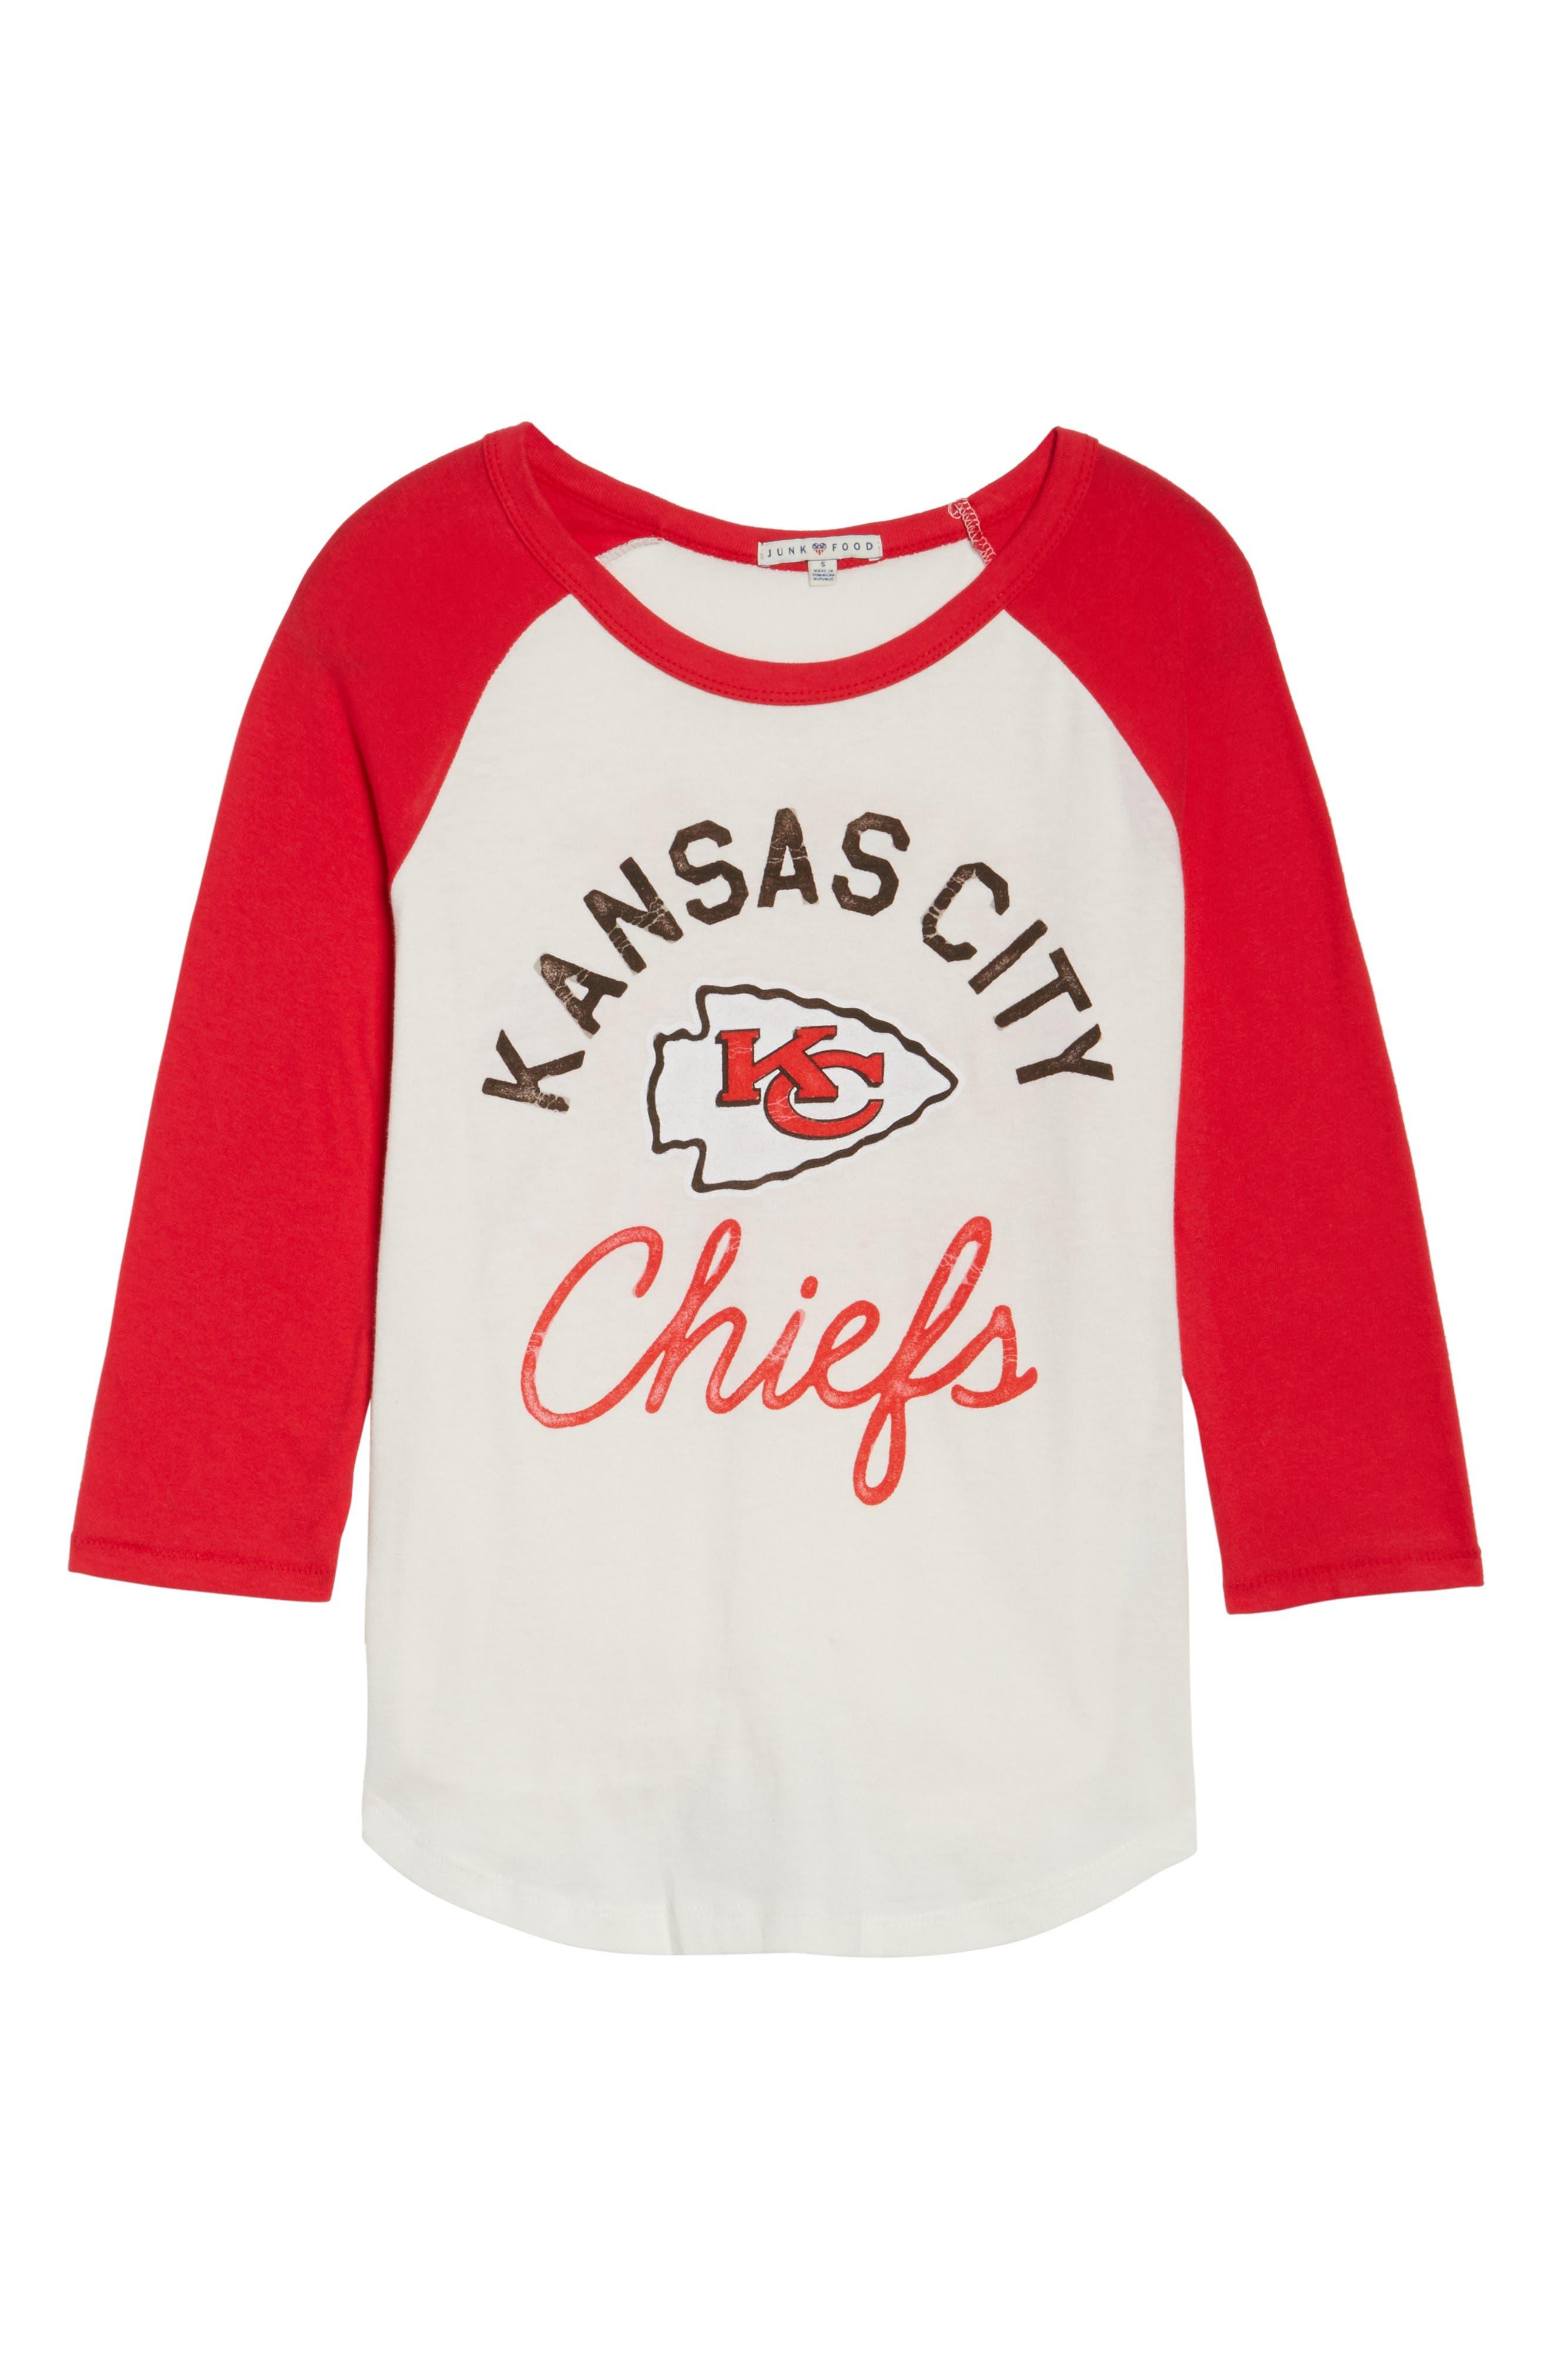 NFL Kansas City Chiefs Raglan Tee,                             Alternate thumbnail 6, color,                             189